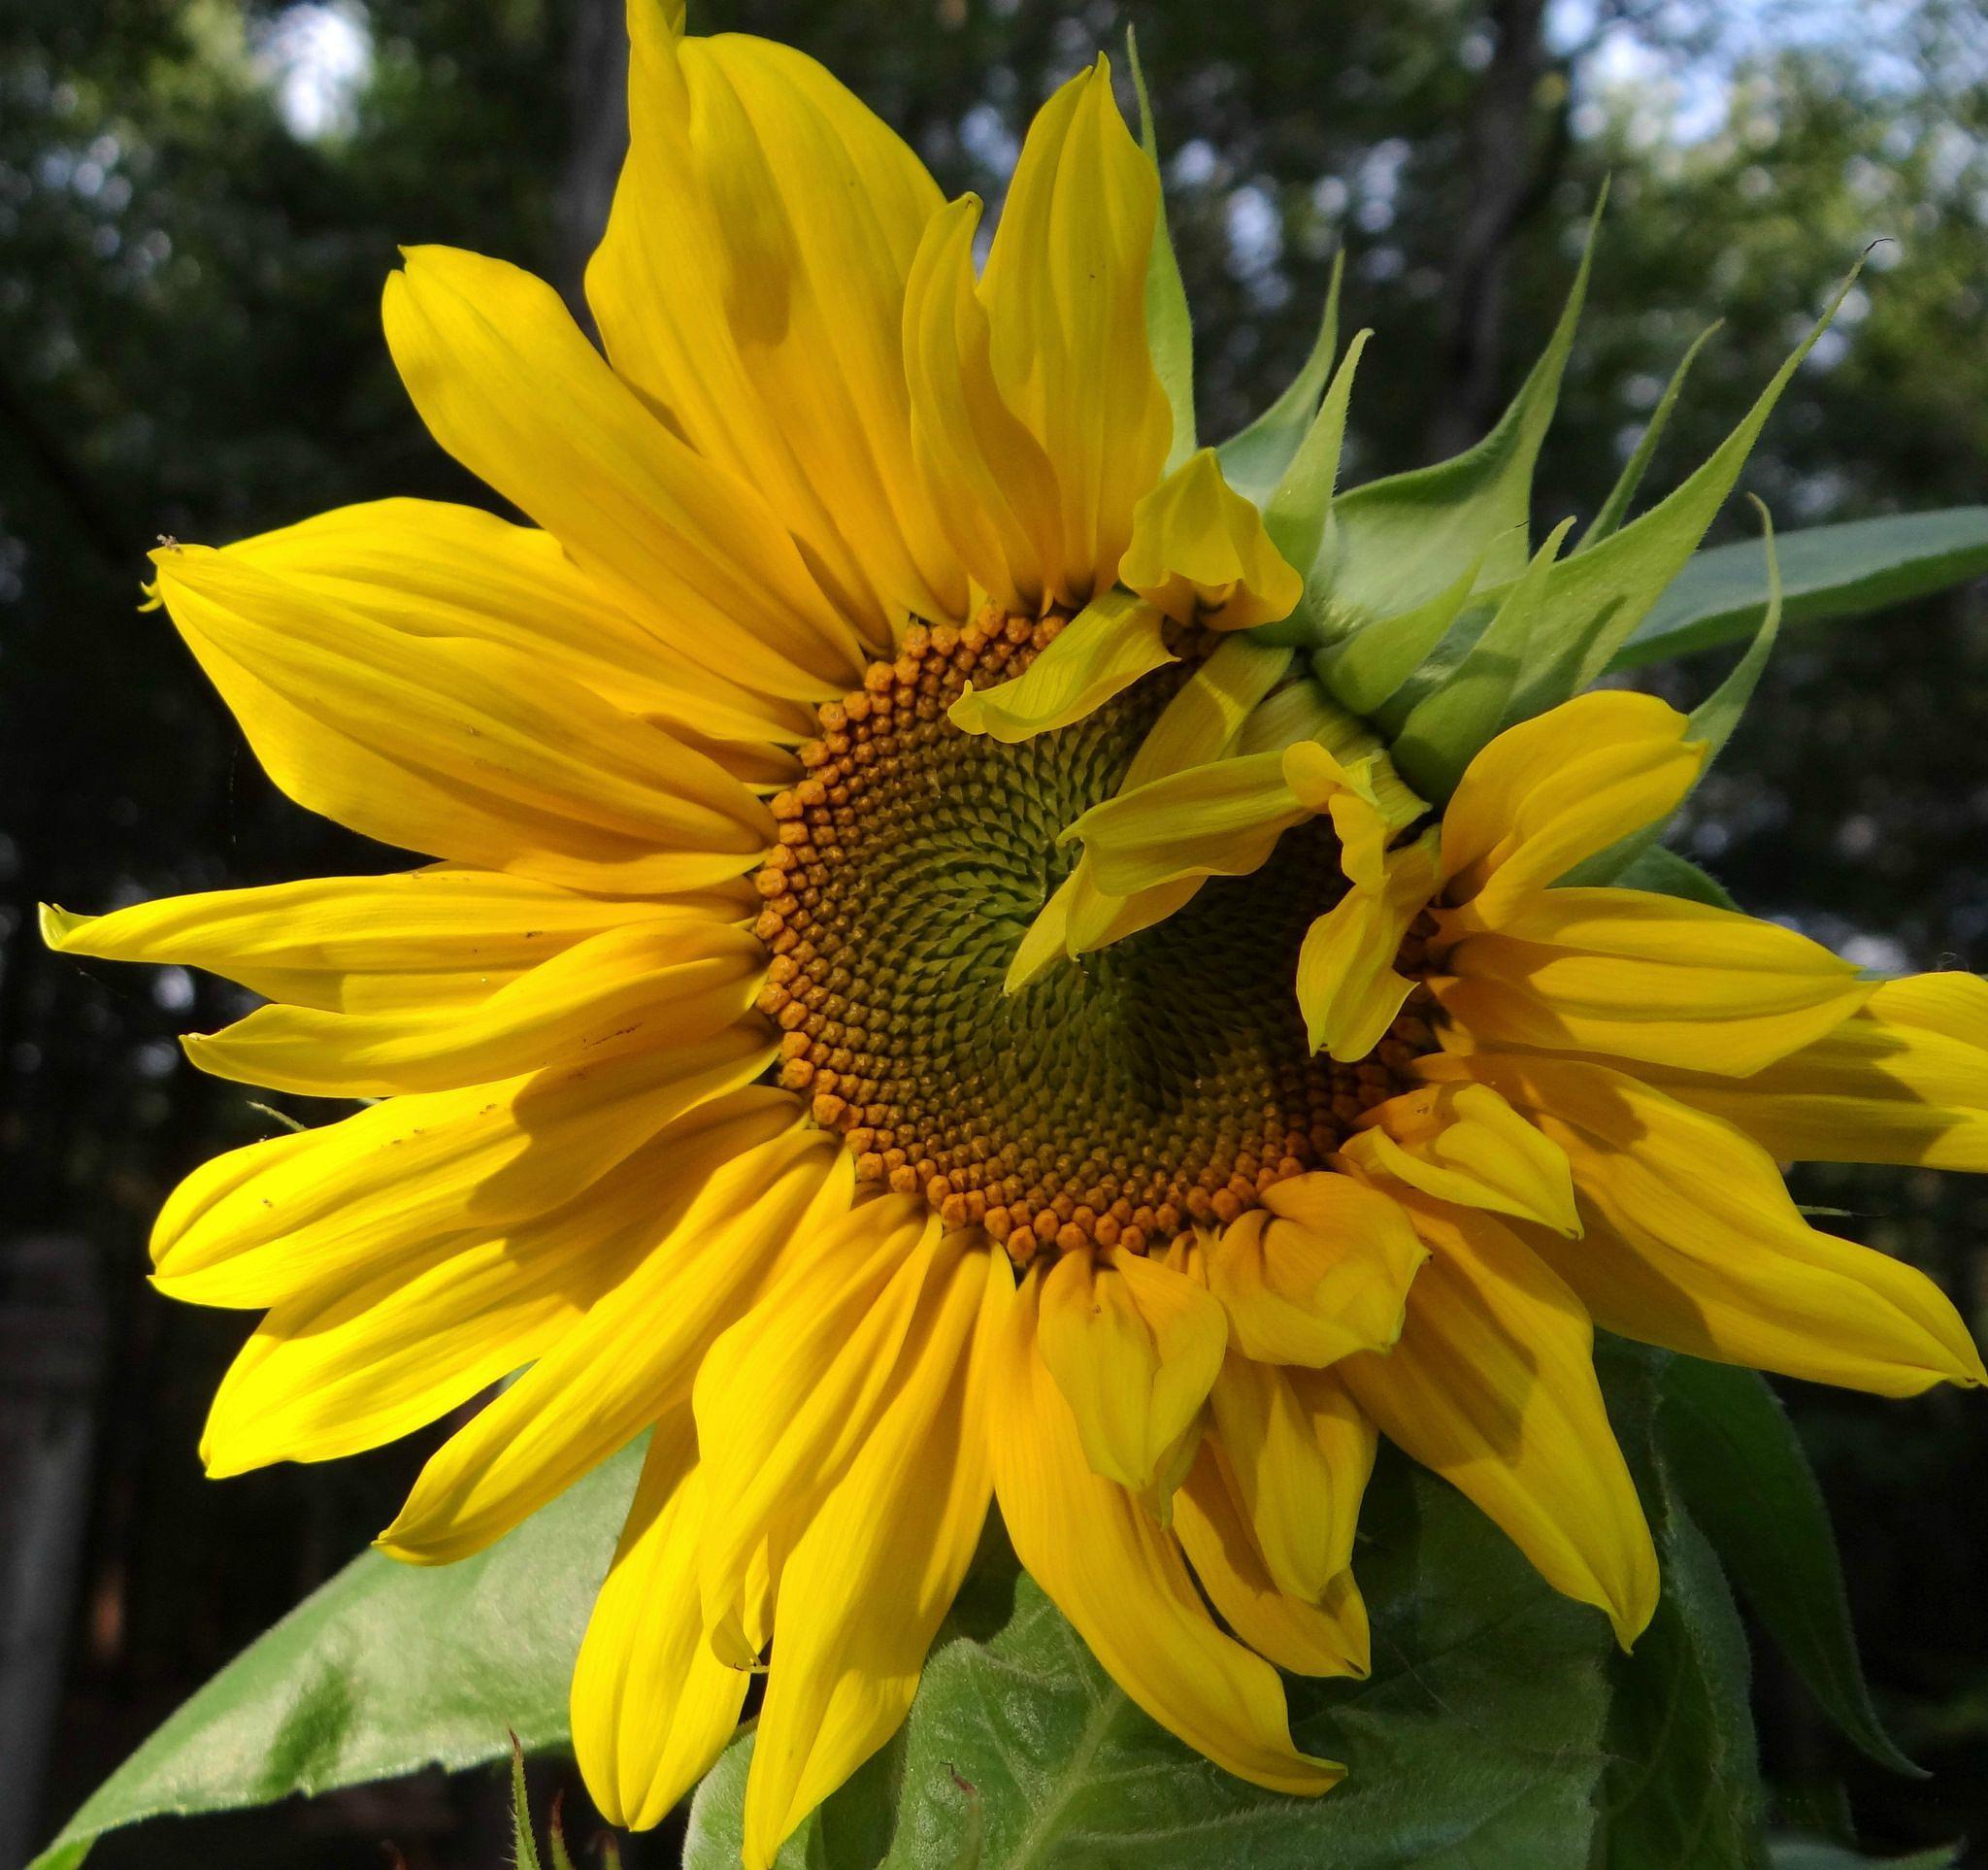 Sunny Sunflower by paulette.king